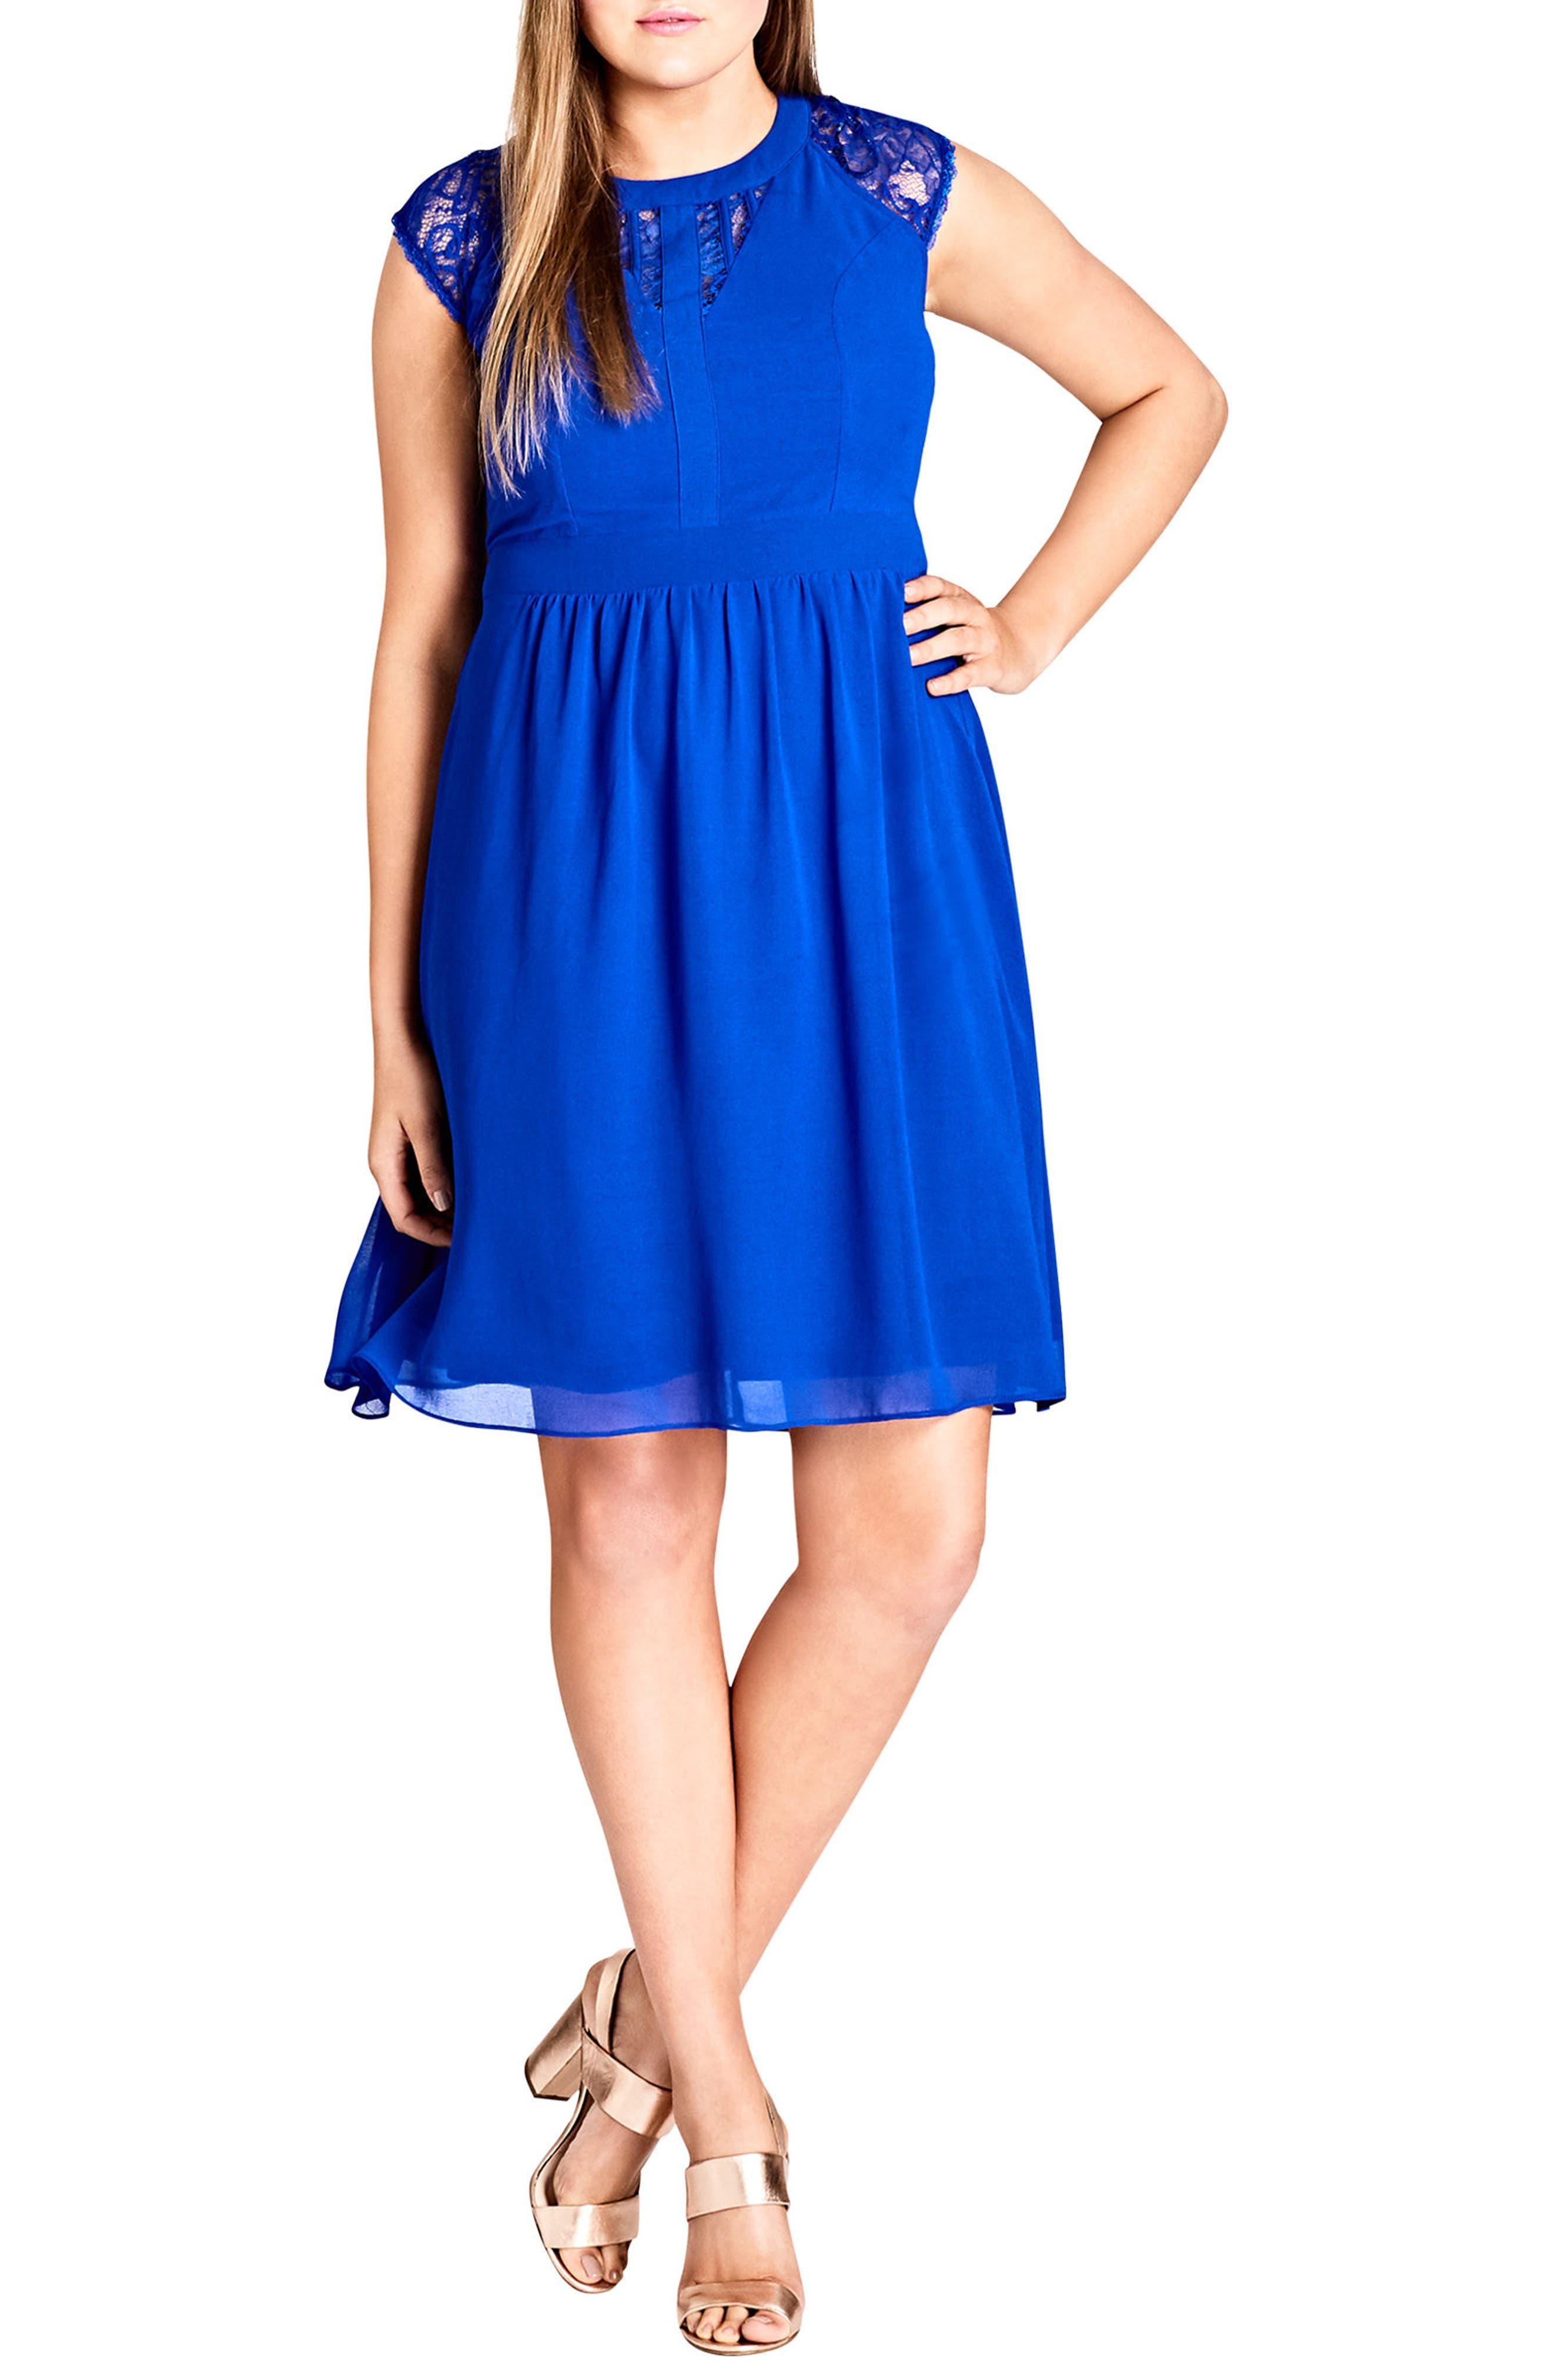 Main Image - City Chic Lace Inset Fit & Flare Dress (Plus Size)